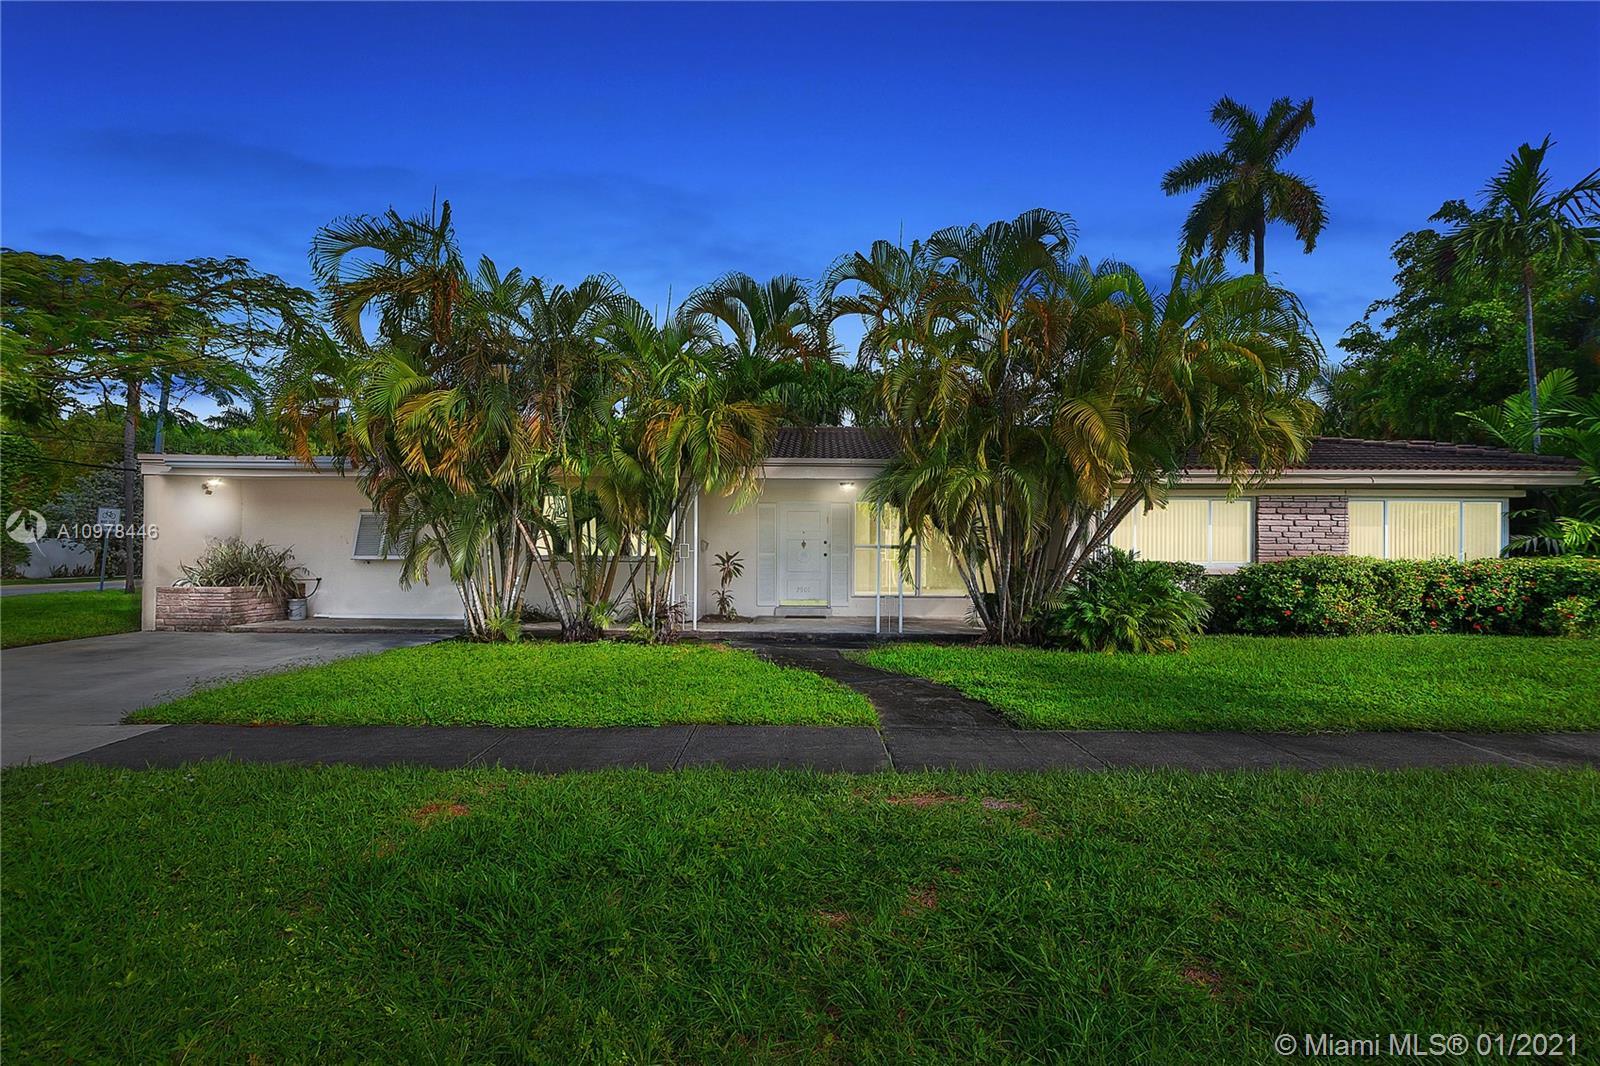 Sunset Lake - 2901 N Bay Rd, Miami Beach, FL 33140